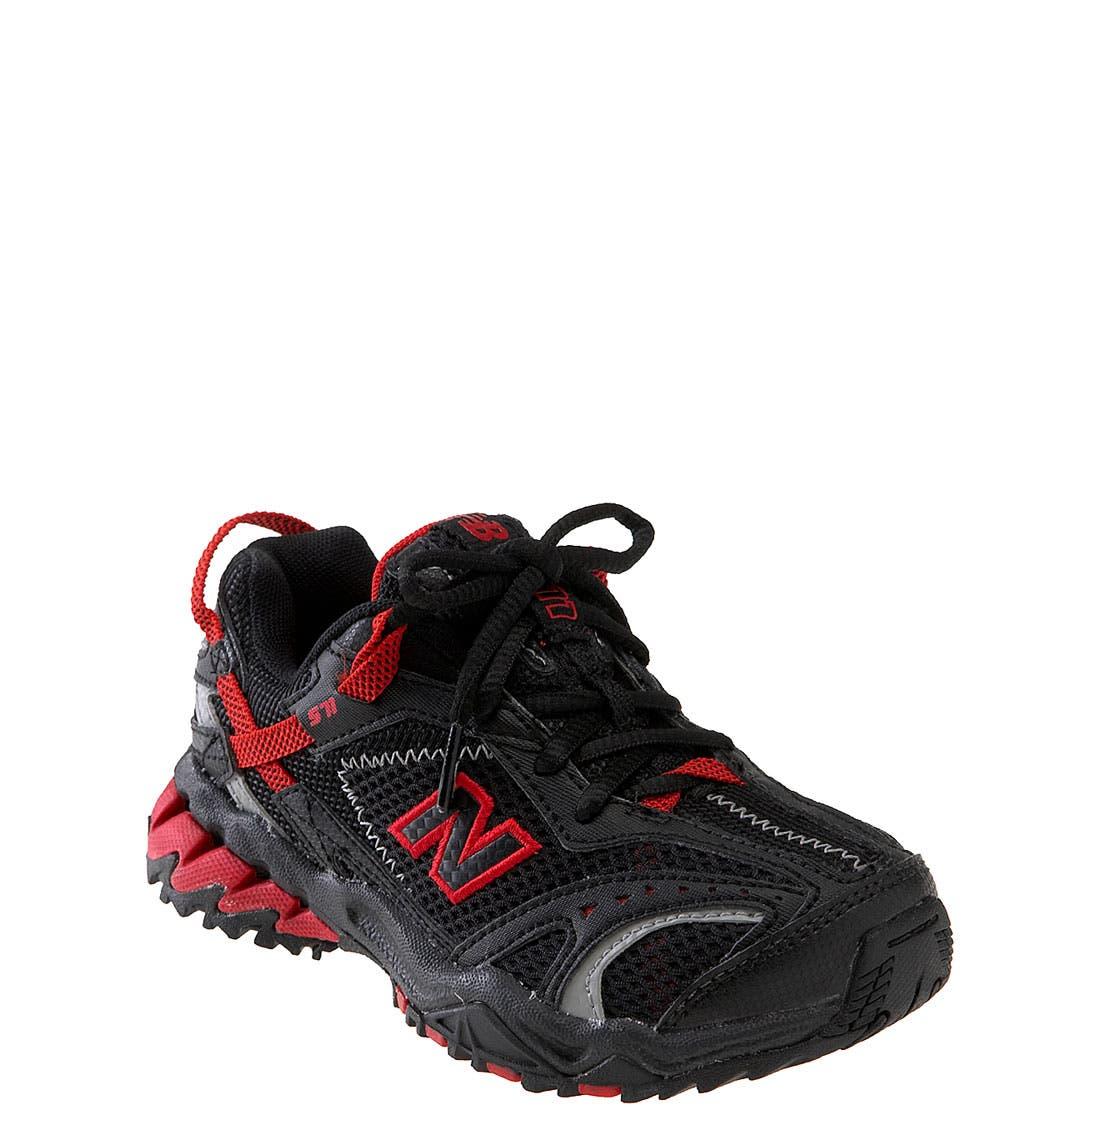 New Balance '571' Trail Running Shoe